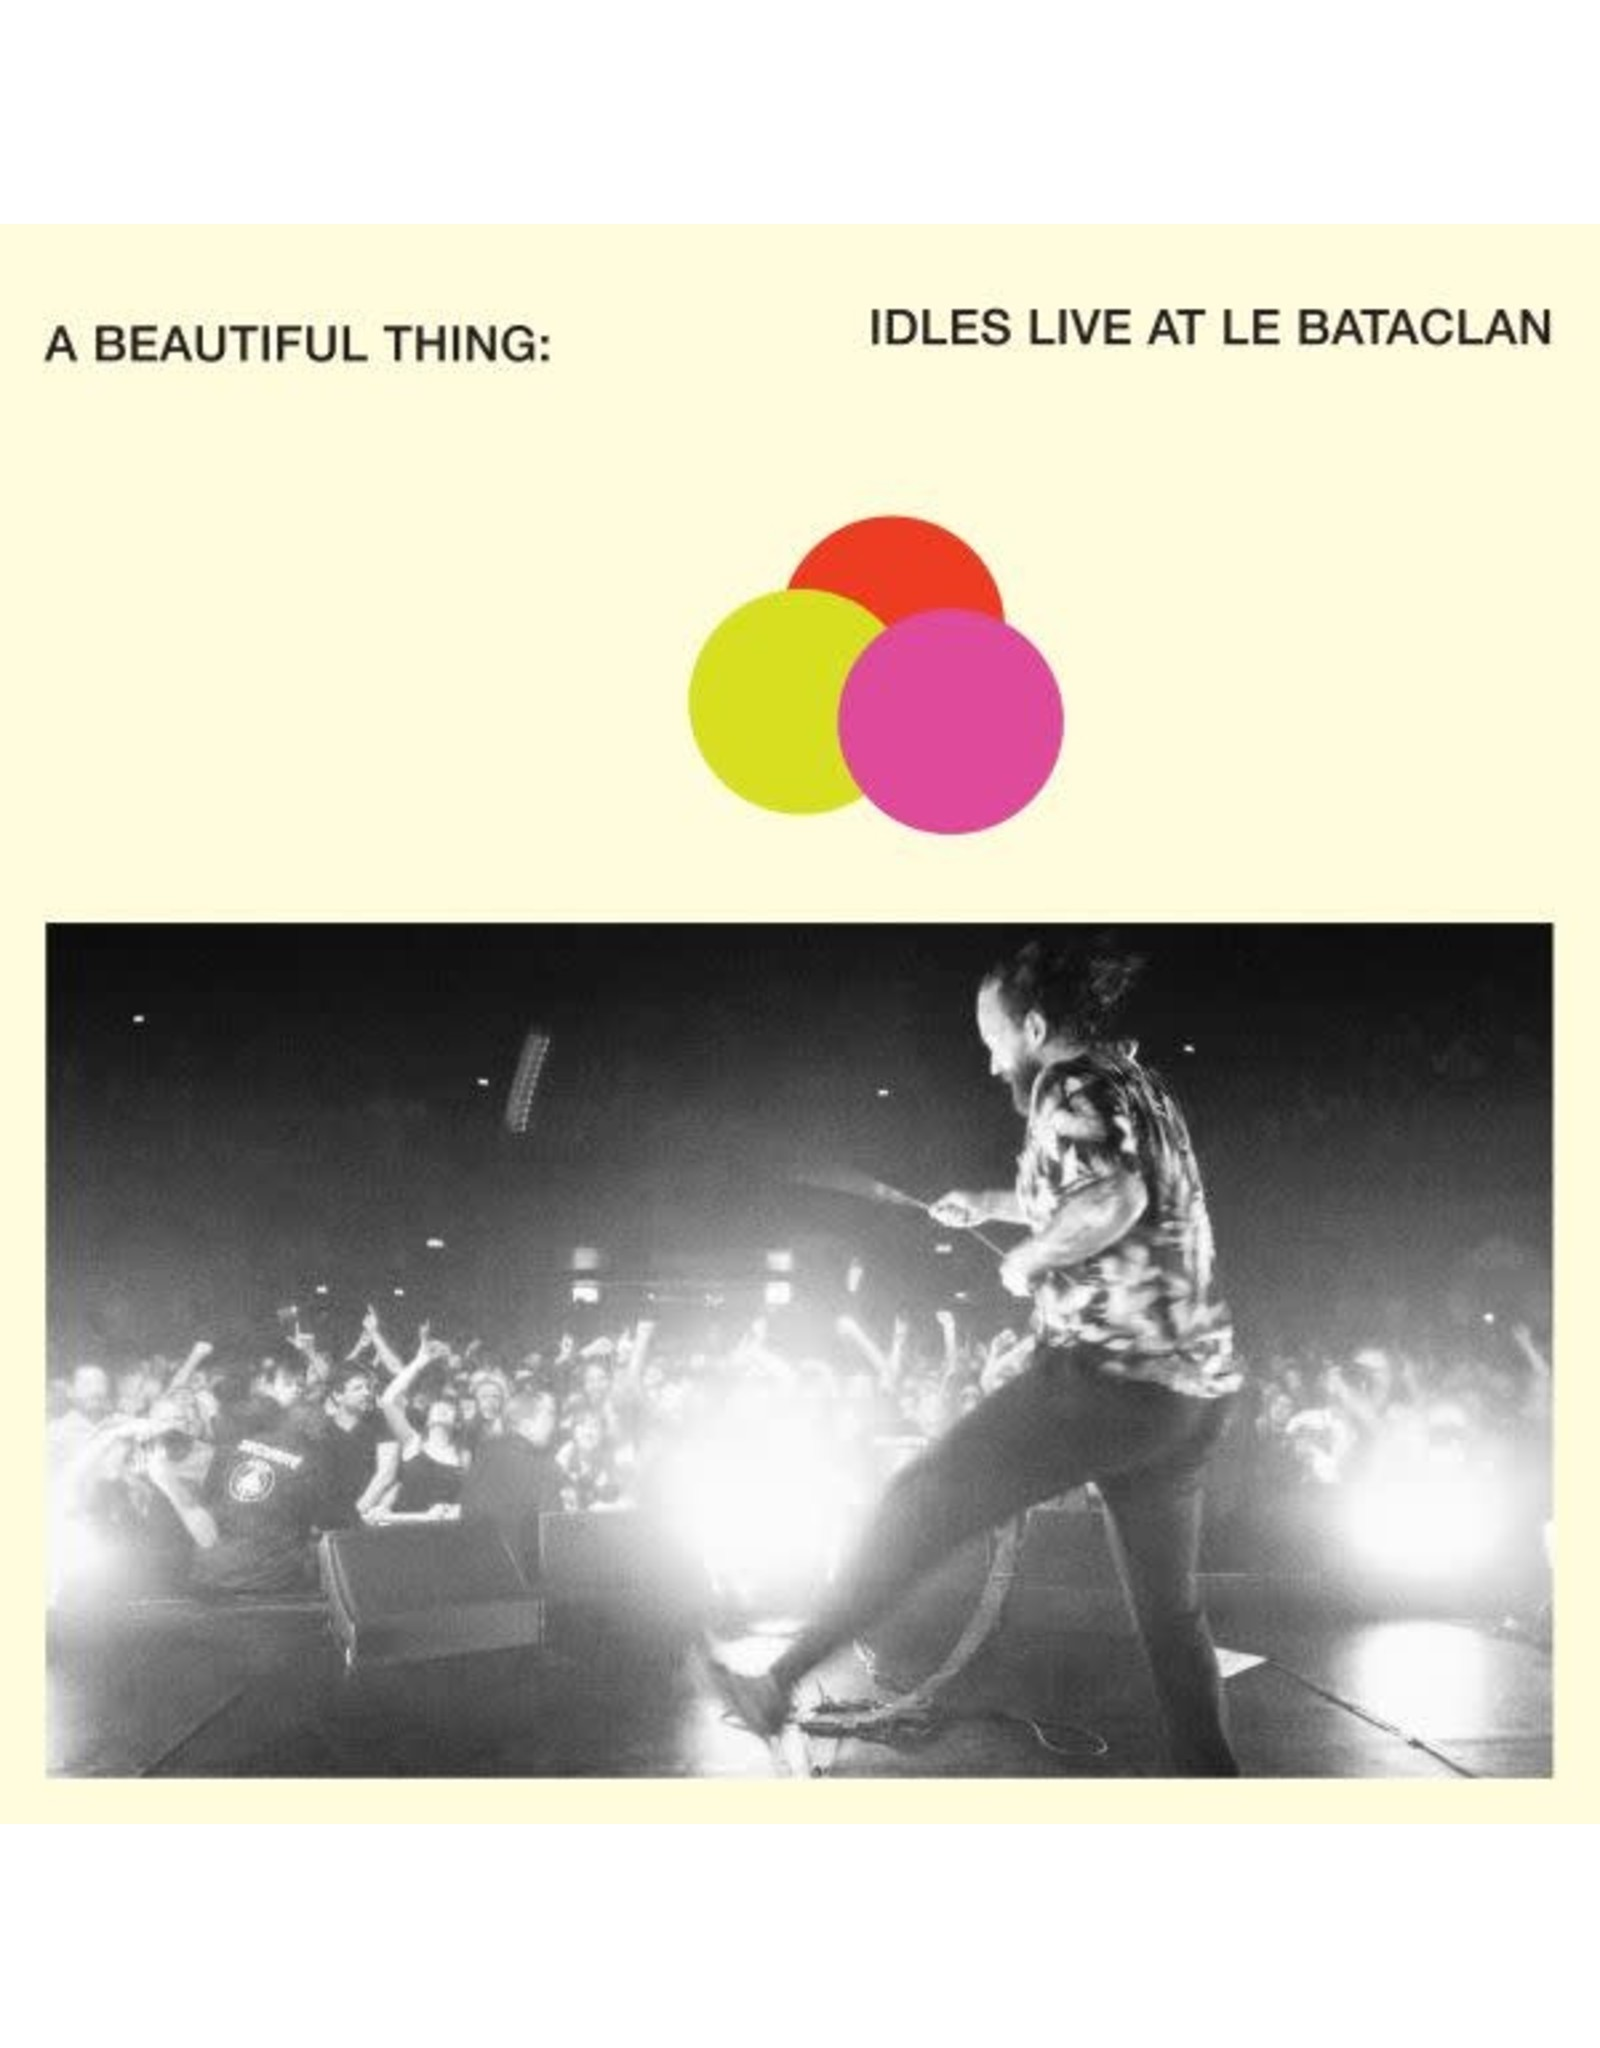 Partisan Idles: A Beautiful Thing : Idles Live at Le Bataclan LP